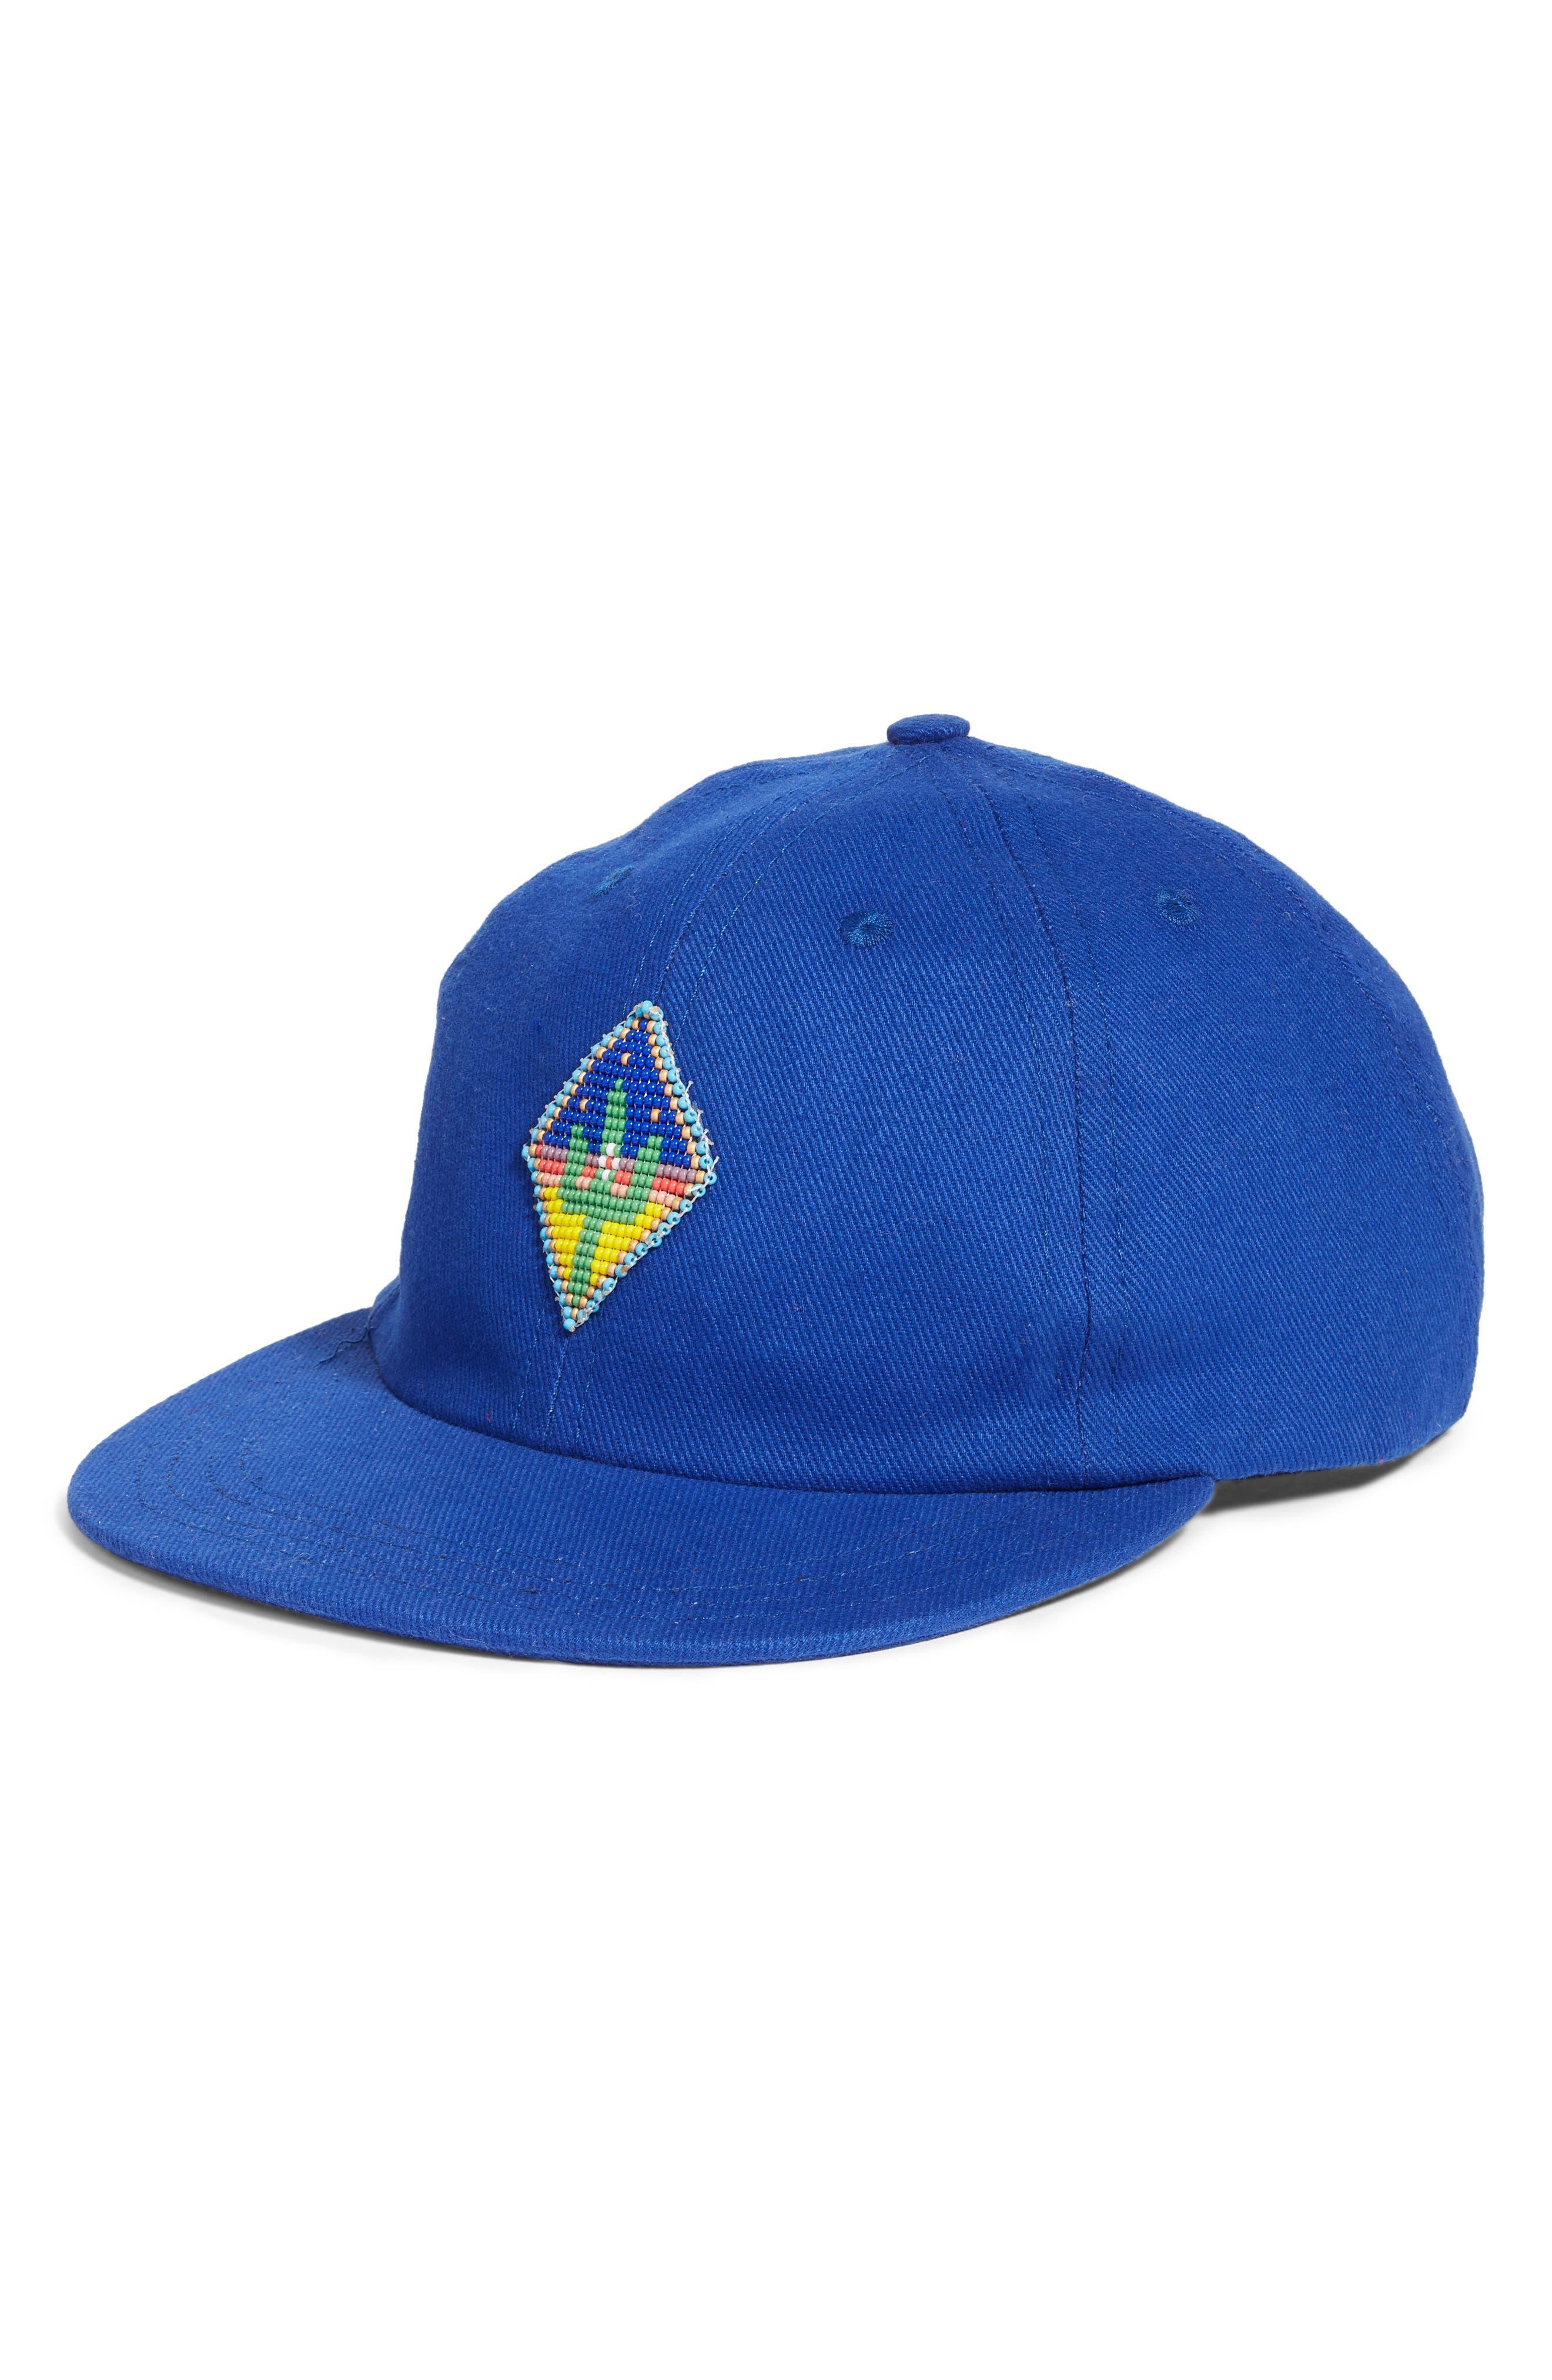 Beaded Cactus Baseball Hat,                         Main,                         color, BLUE